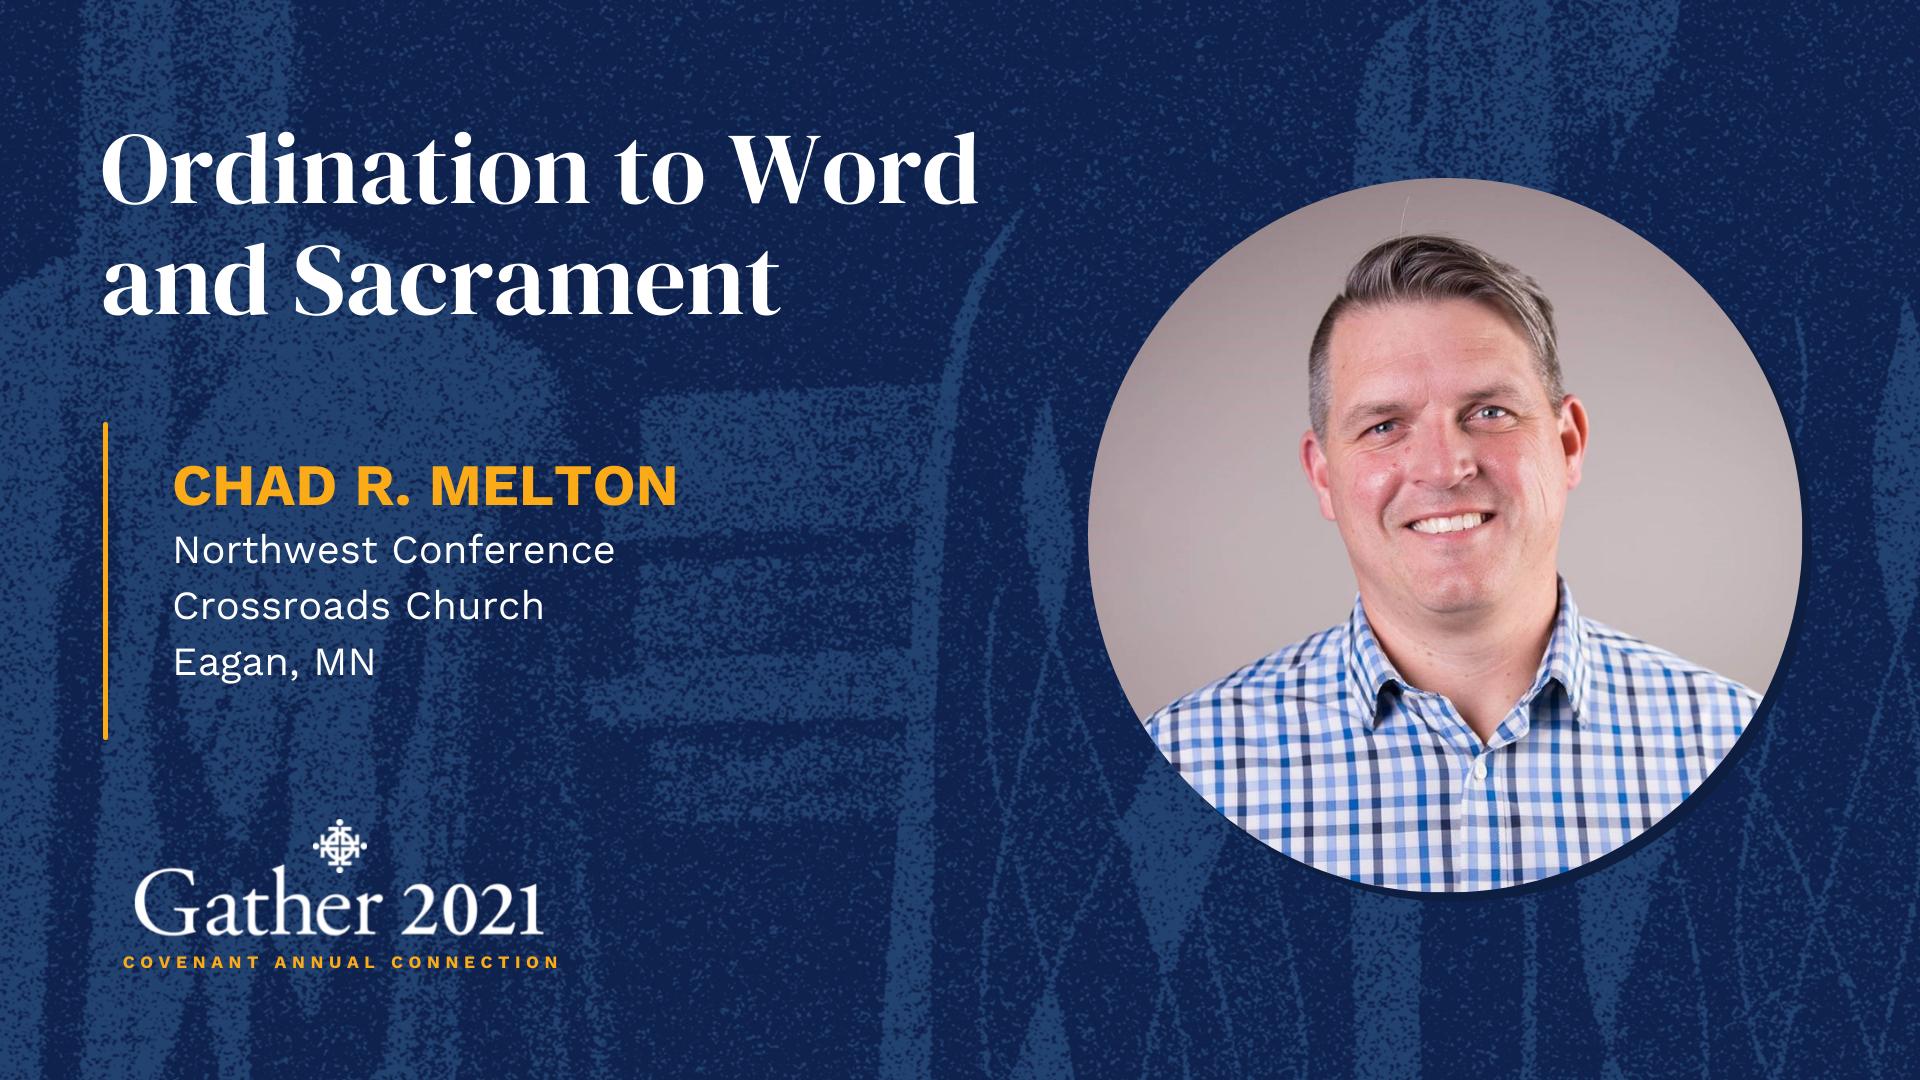 Chad R. Melton